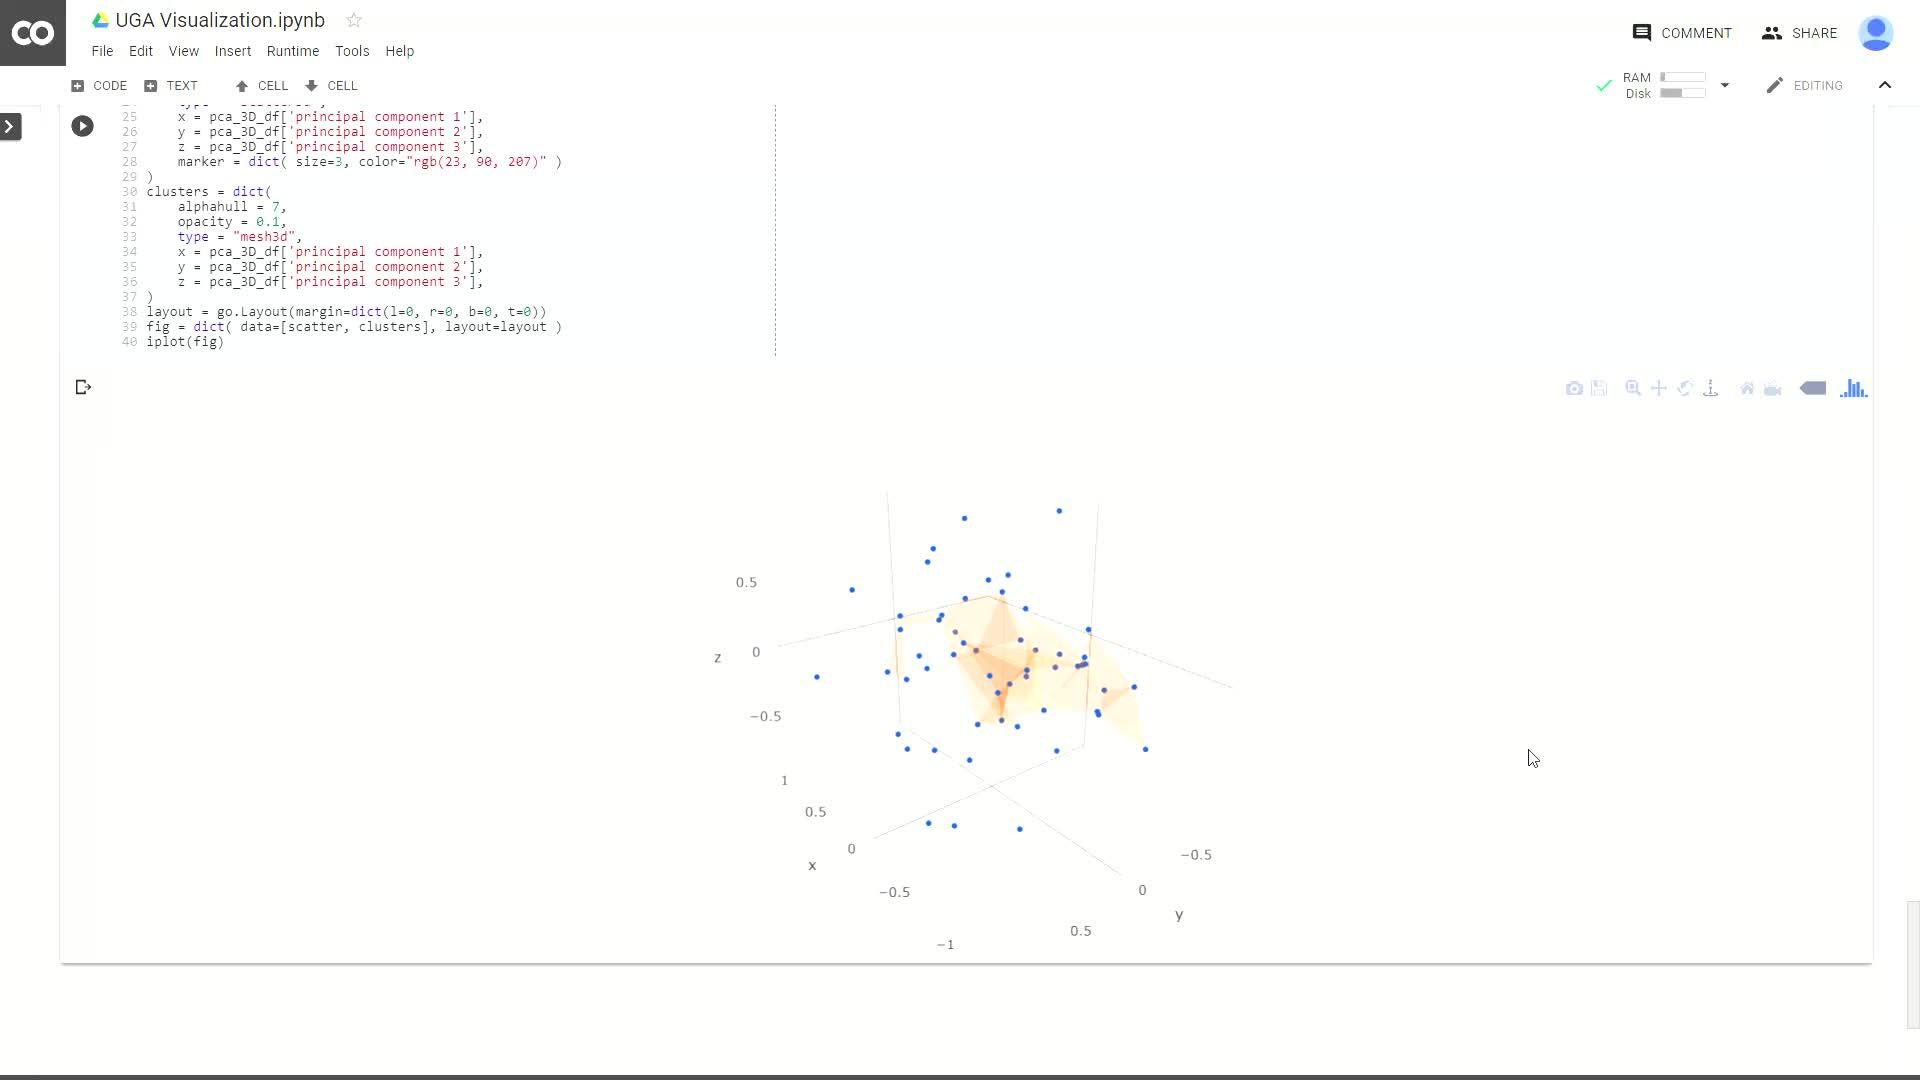 UGA Visualization Ipynb Colaboratory Google Chrome 6 13 2019 8 50 47 PM